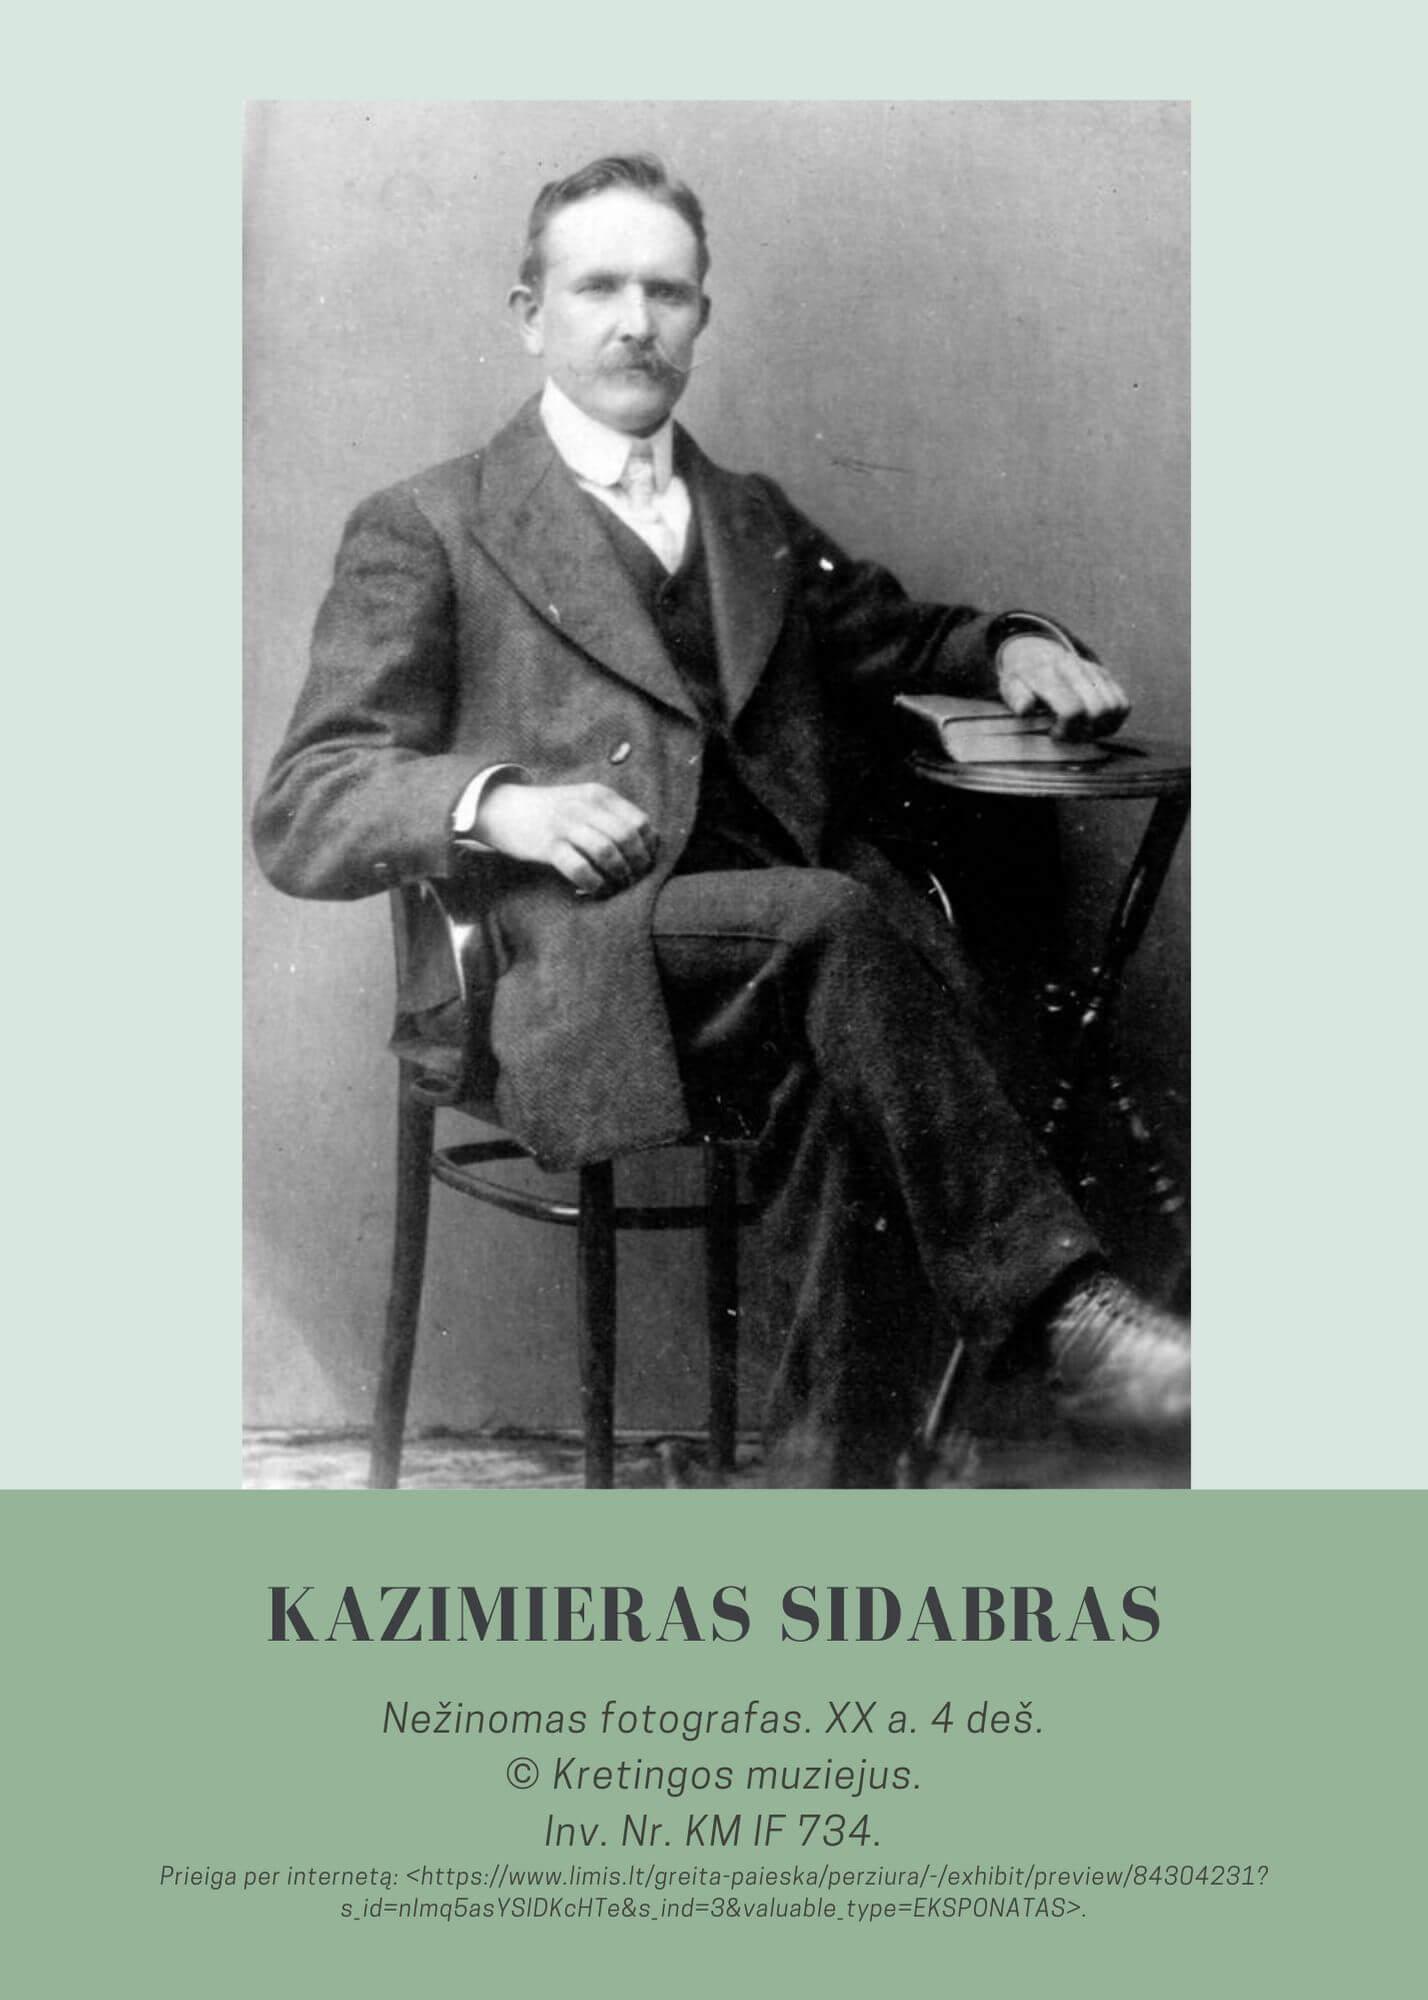 Kazimieras Sidabras